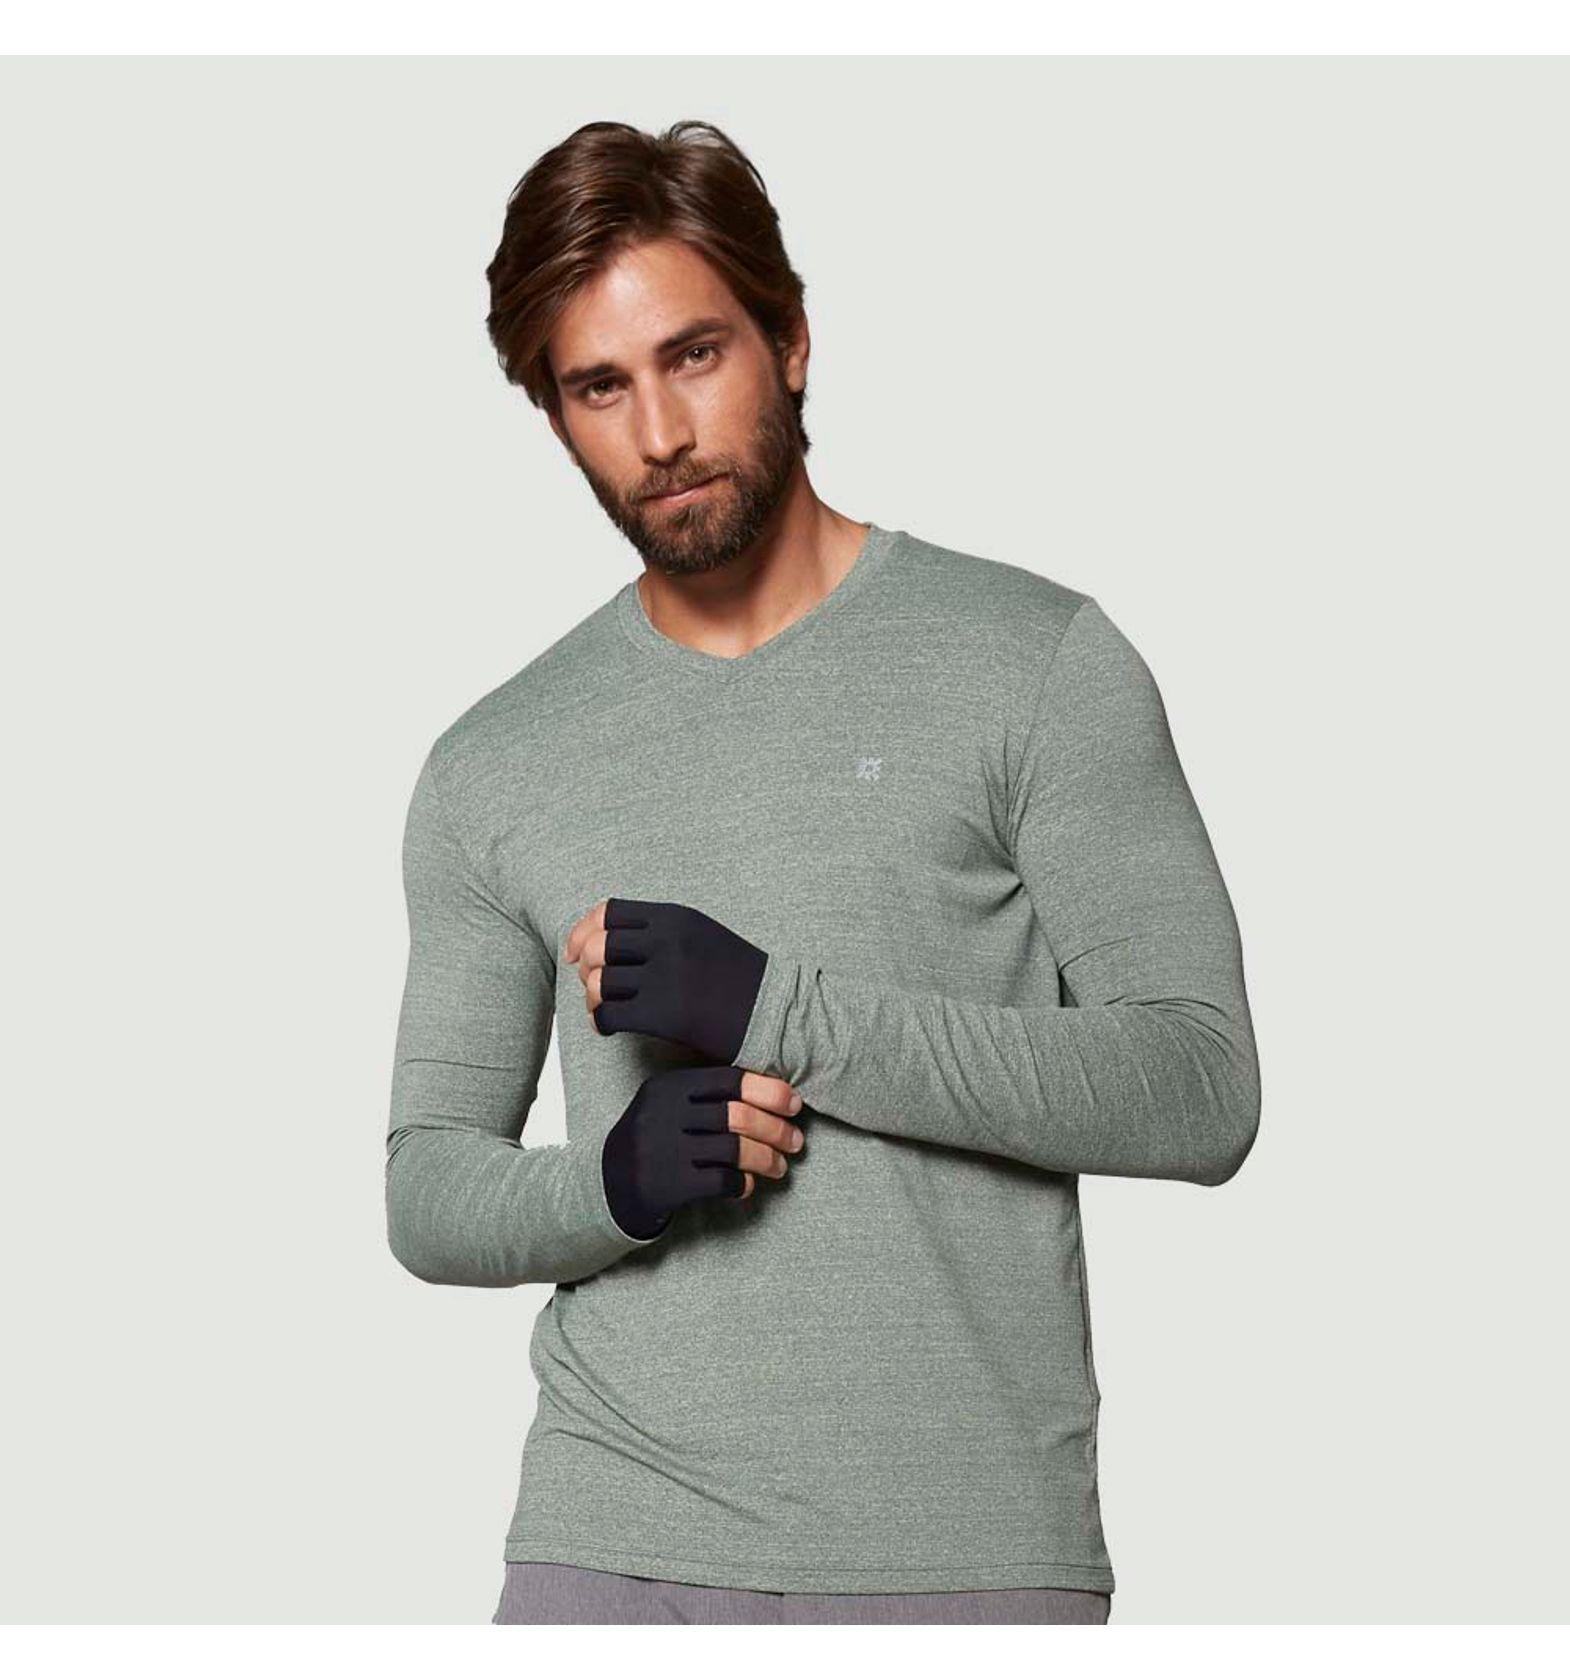 UV LINE Camiseta Sport Fit Manga Longa Masculina Amarelo Mescla Proteção Solar